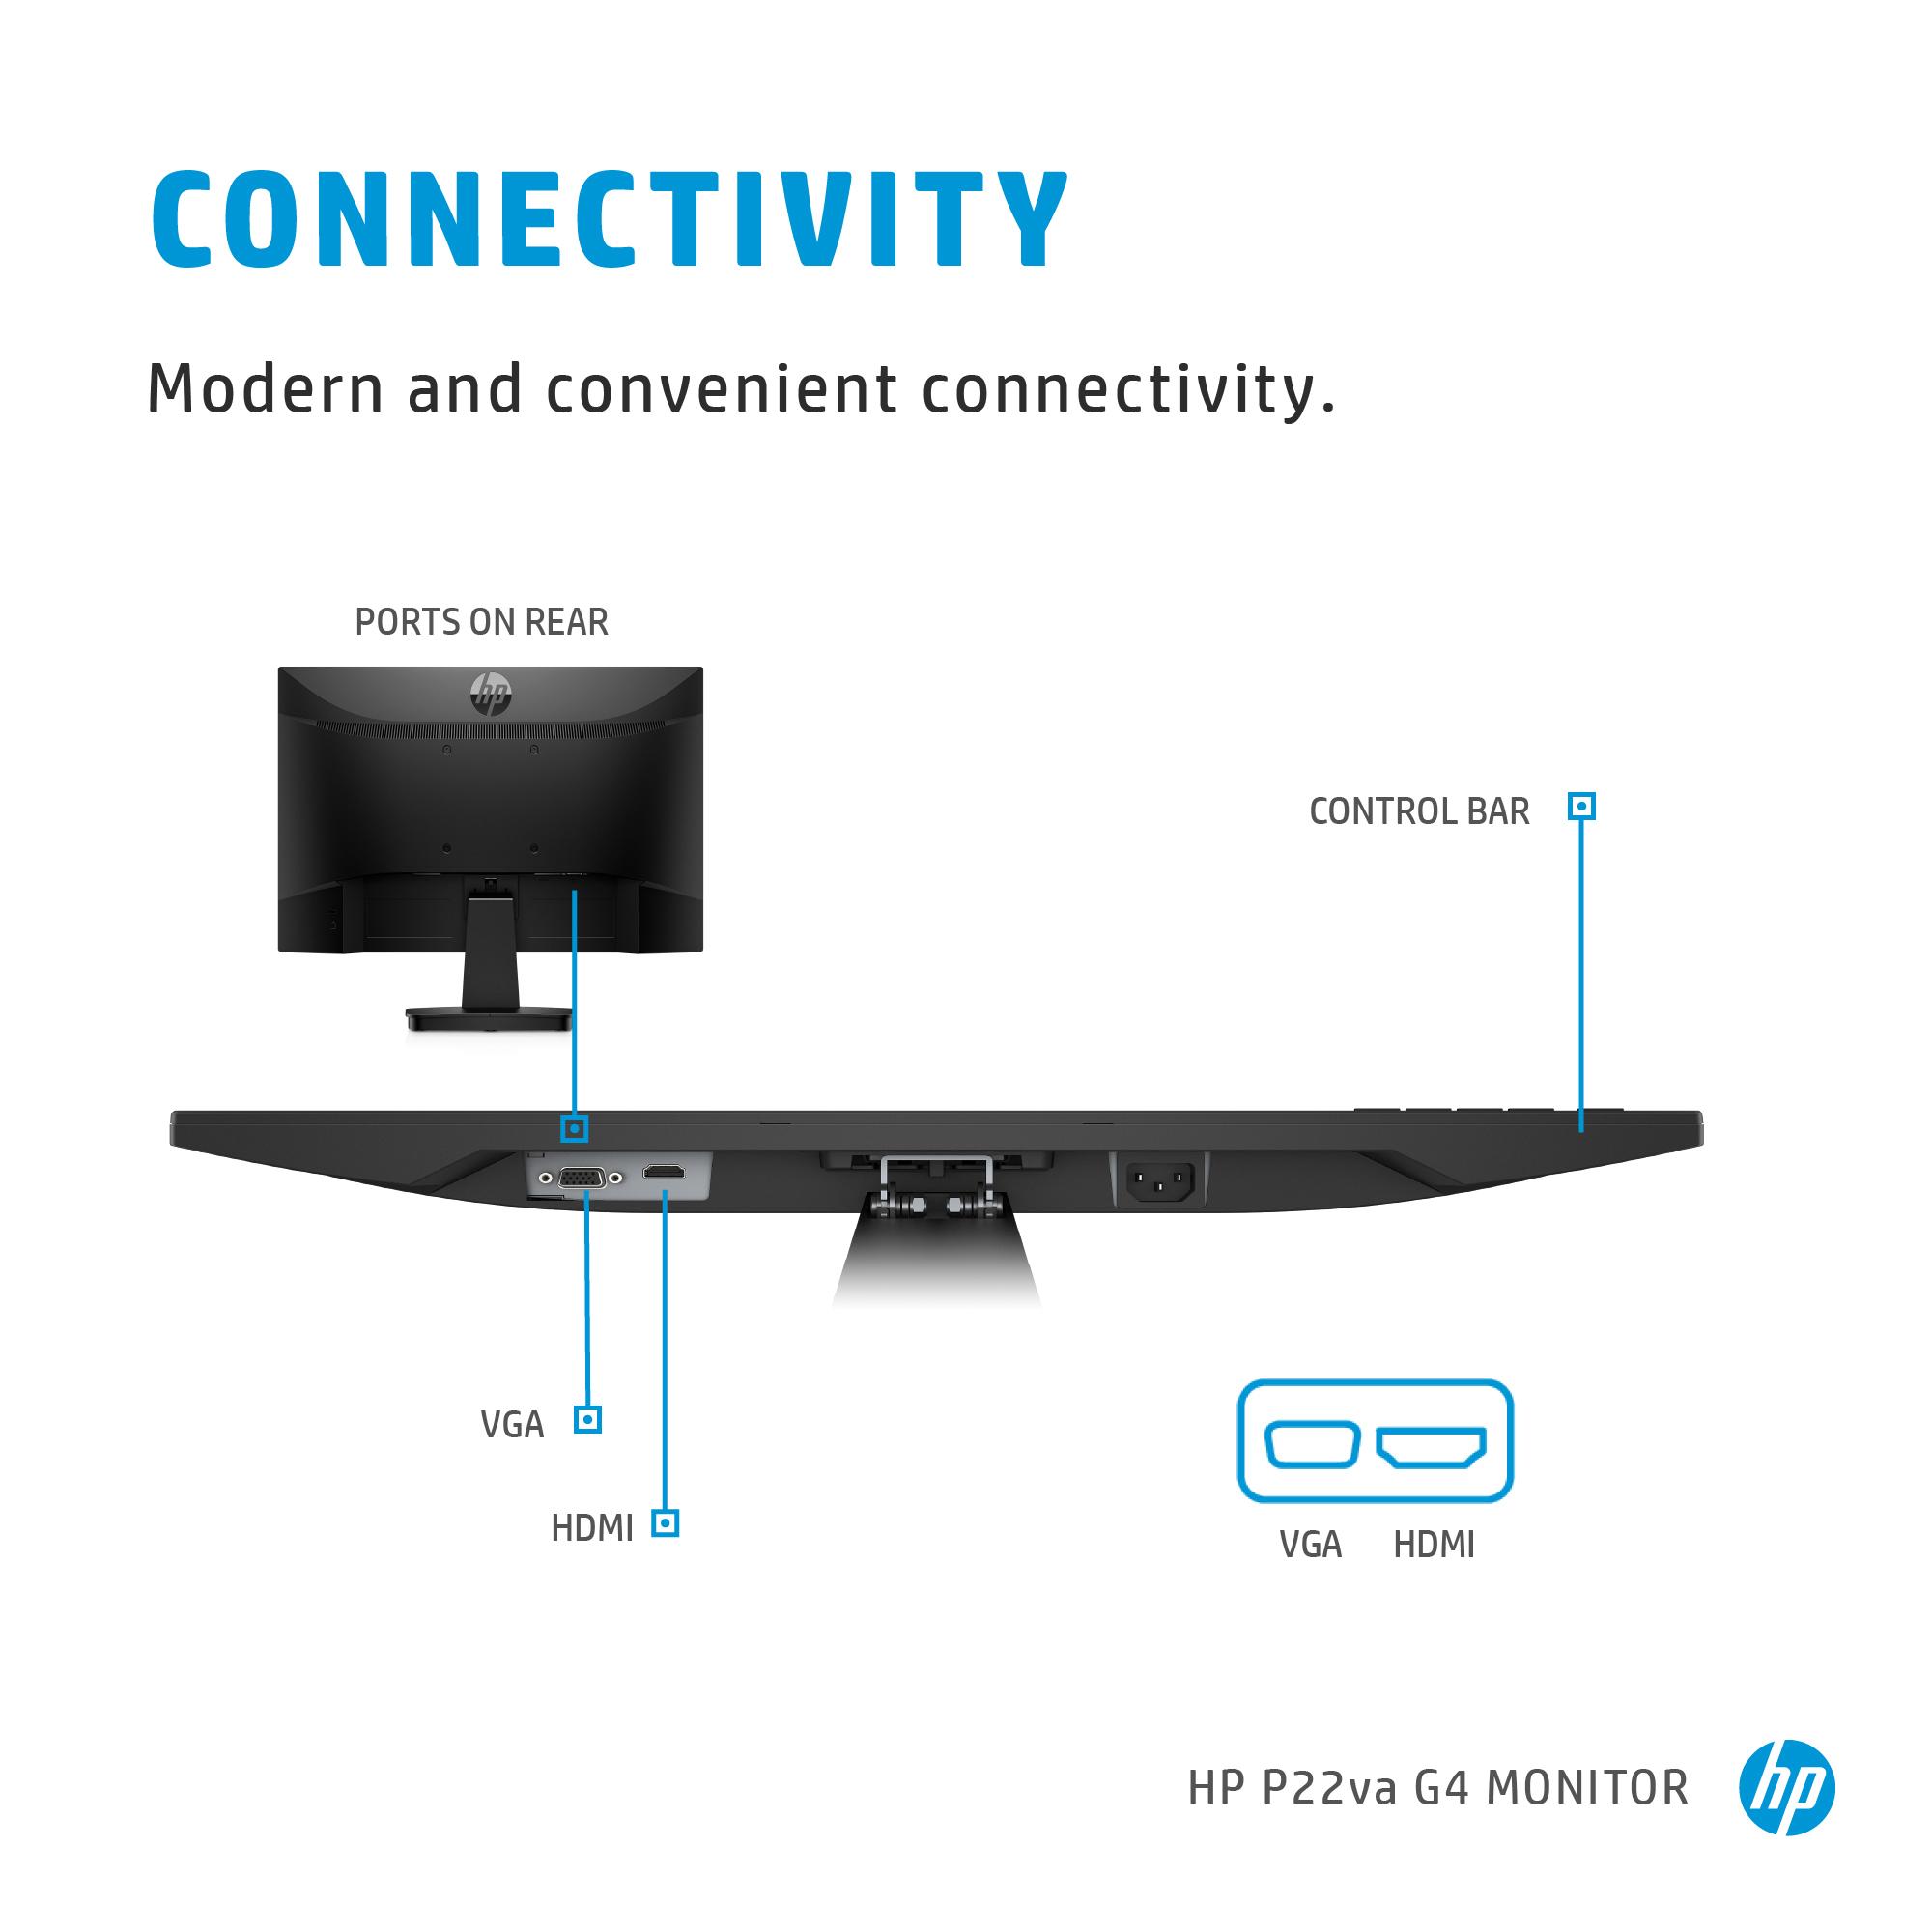 HP P22va G4 FHD Monitor